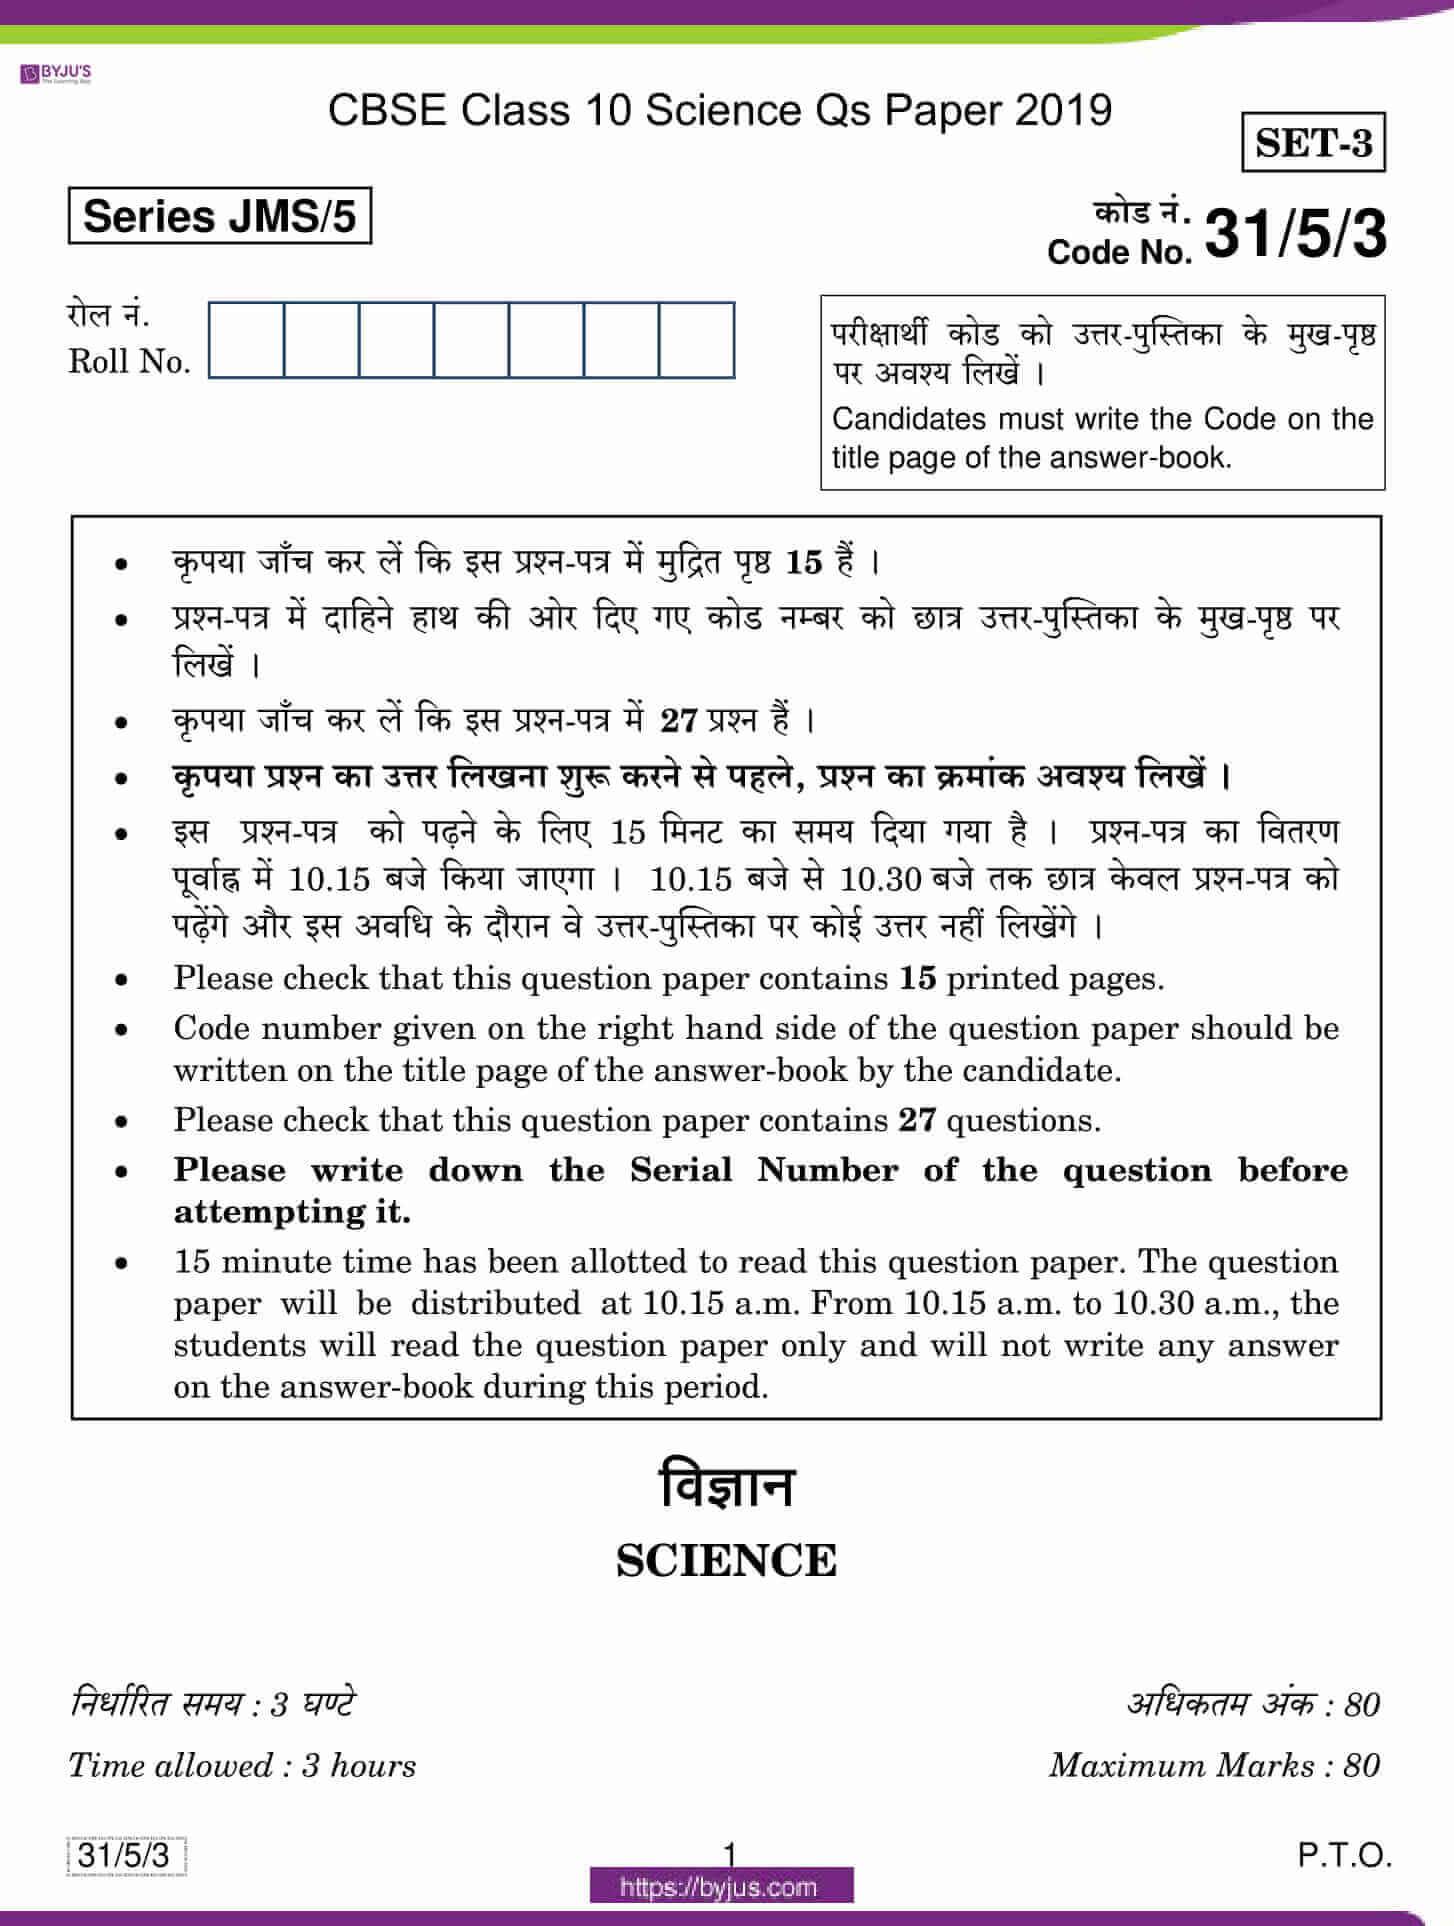 CBSE class 10 Question paper science 2019 set 1